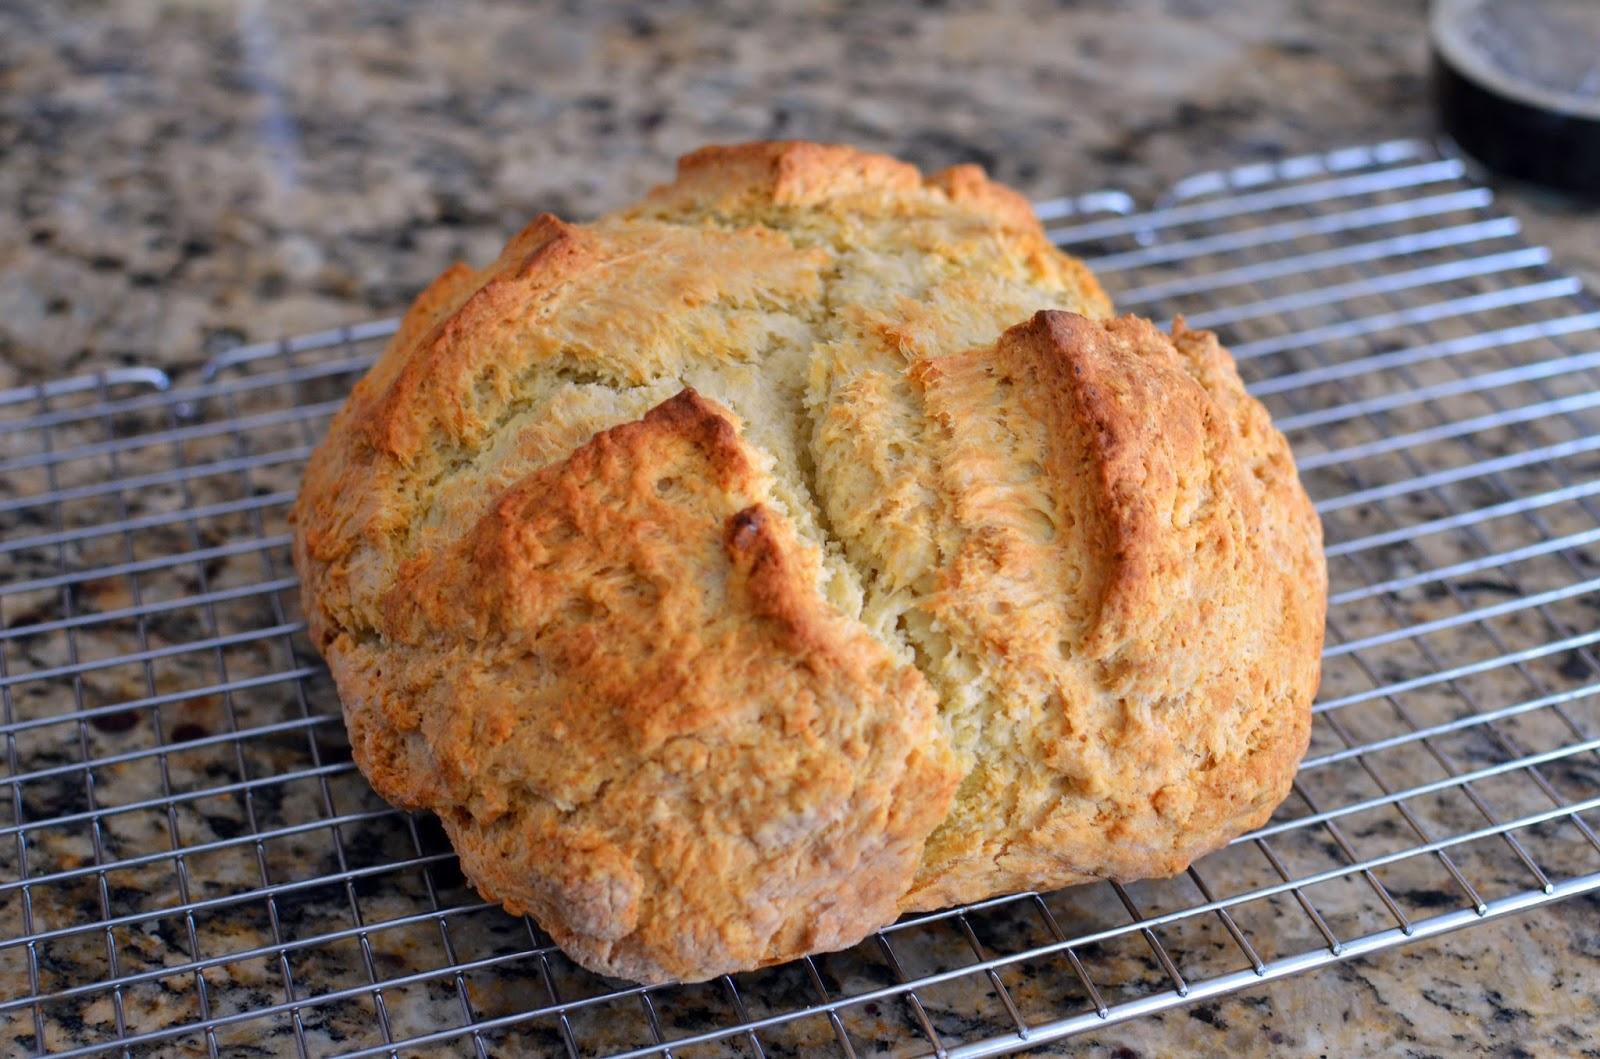 Irish Soda Bread - ButterYum — how to make traditional irish soda bread. Irish soda bread recipe. how to bake irish soda bread at home. recipe for irish soda bread. recipe for traditional irish soda bread.